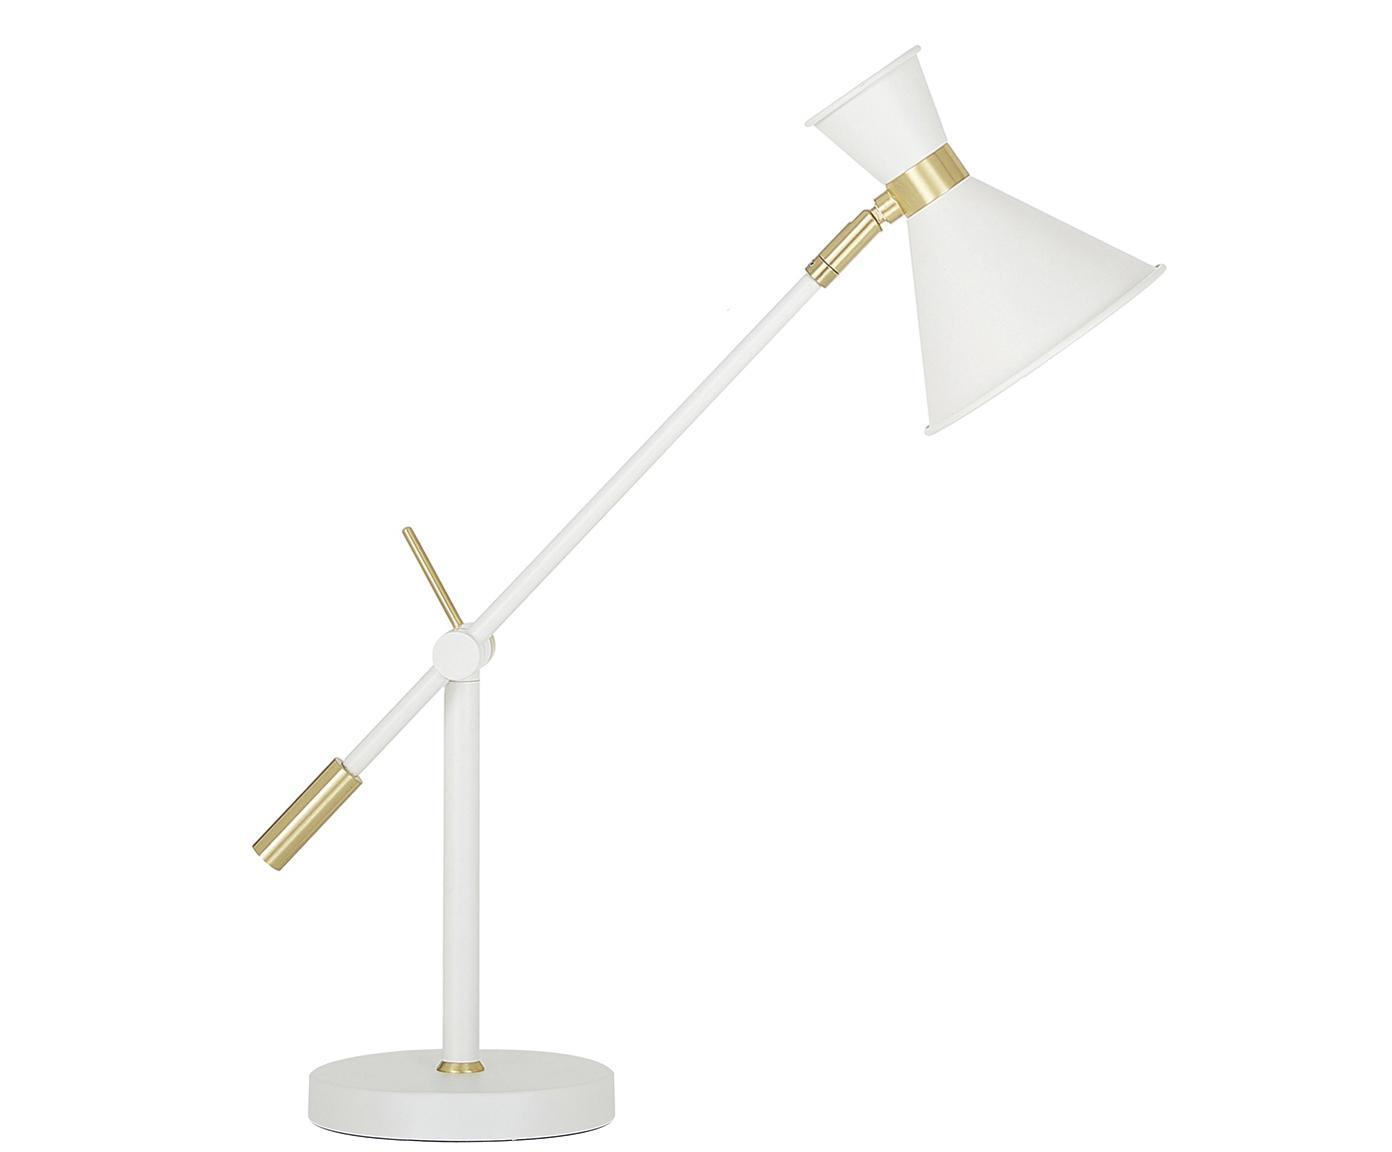 Tafellamp Audrey, Lampenkap: gepoedercoat metaal, verm, Lampvoet: gepoedercoat metaal; verm, Mat wit, Ø 15 x H 68 cm